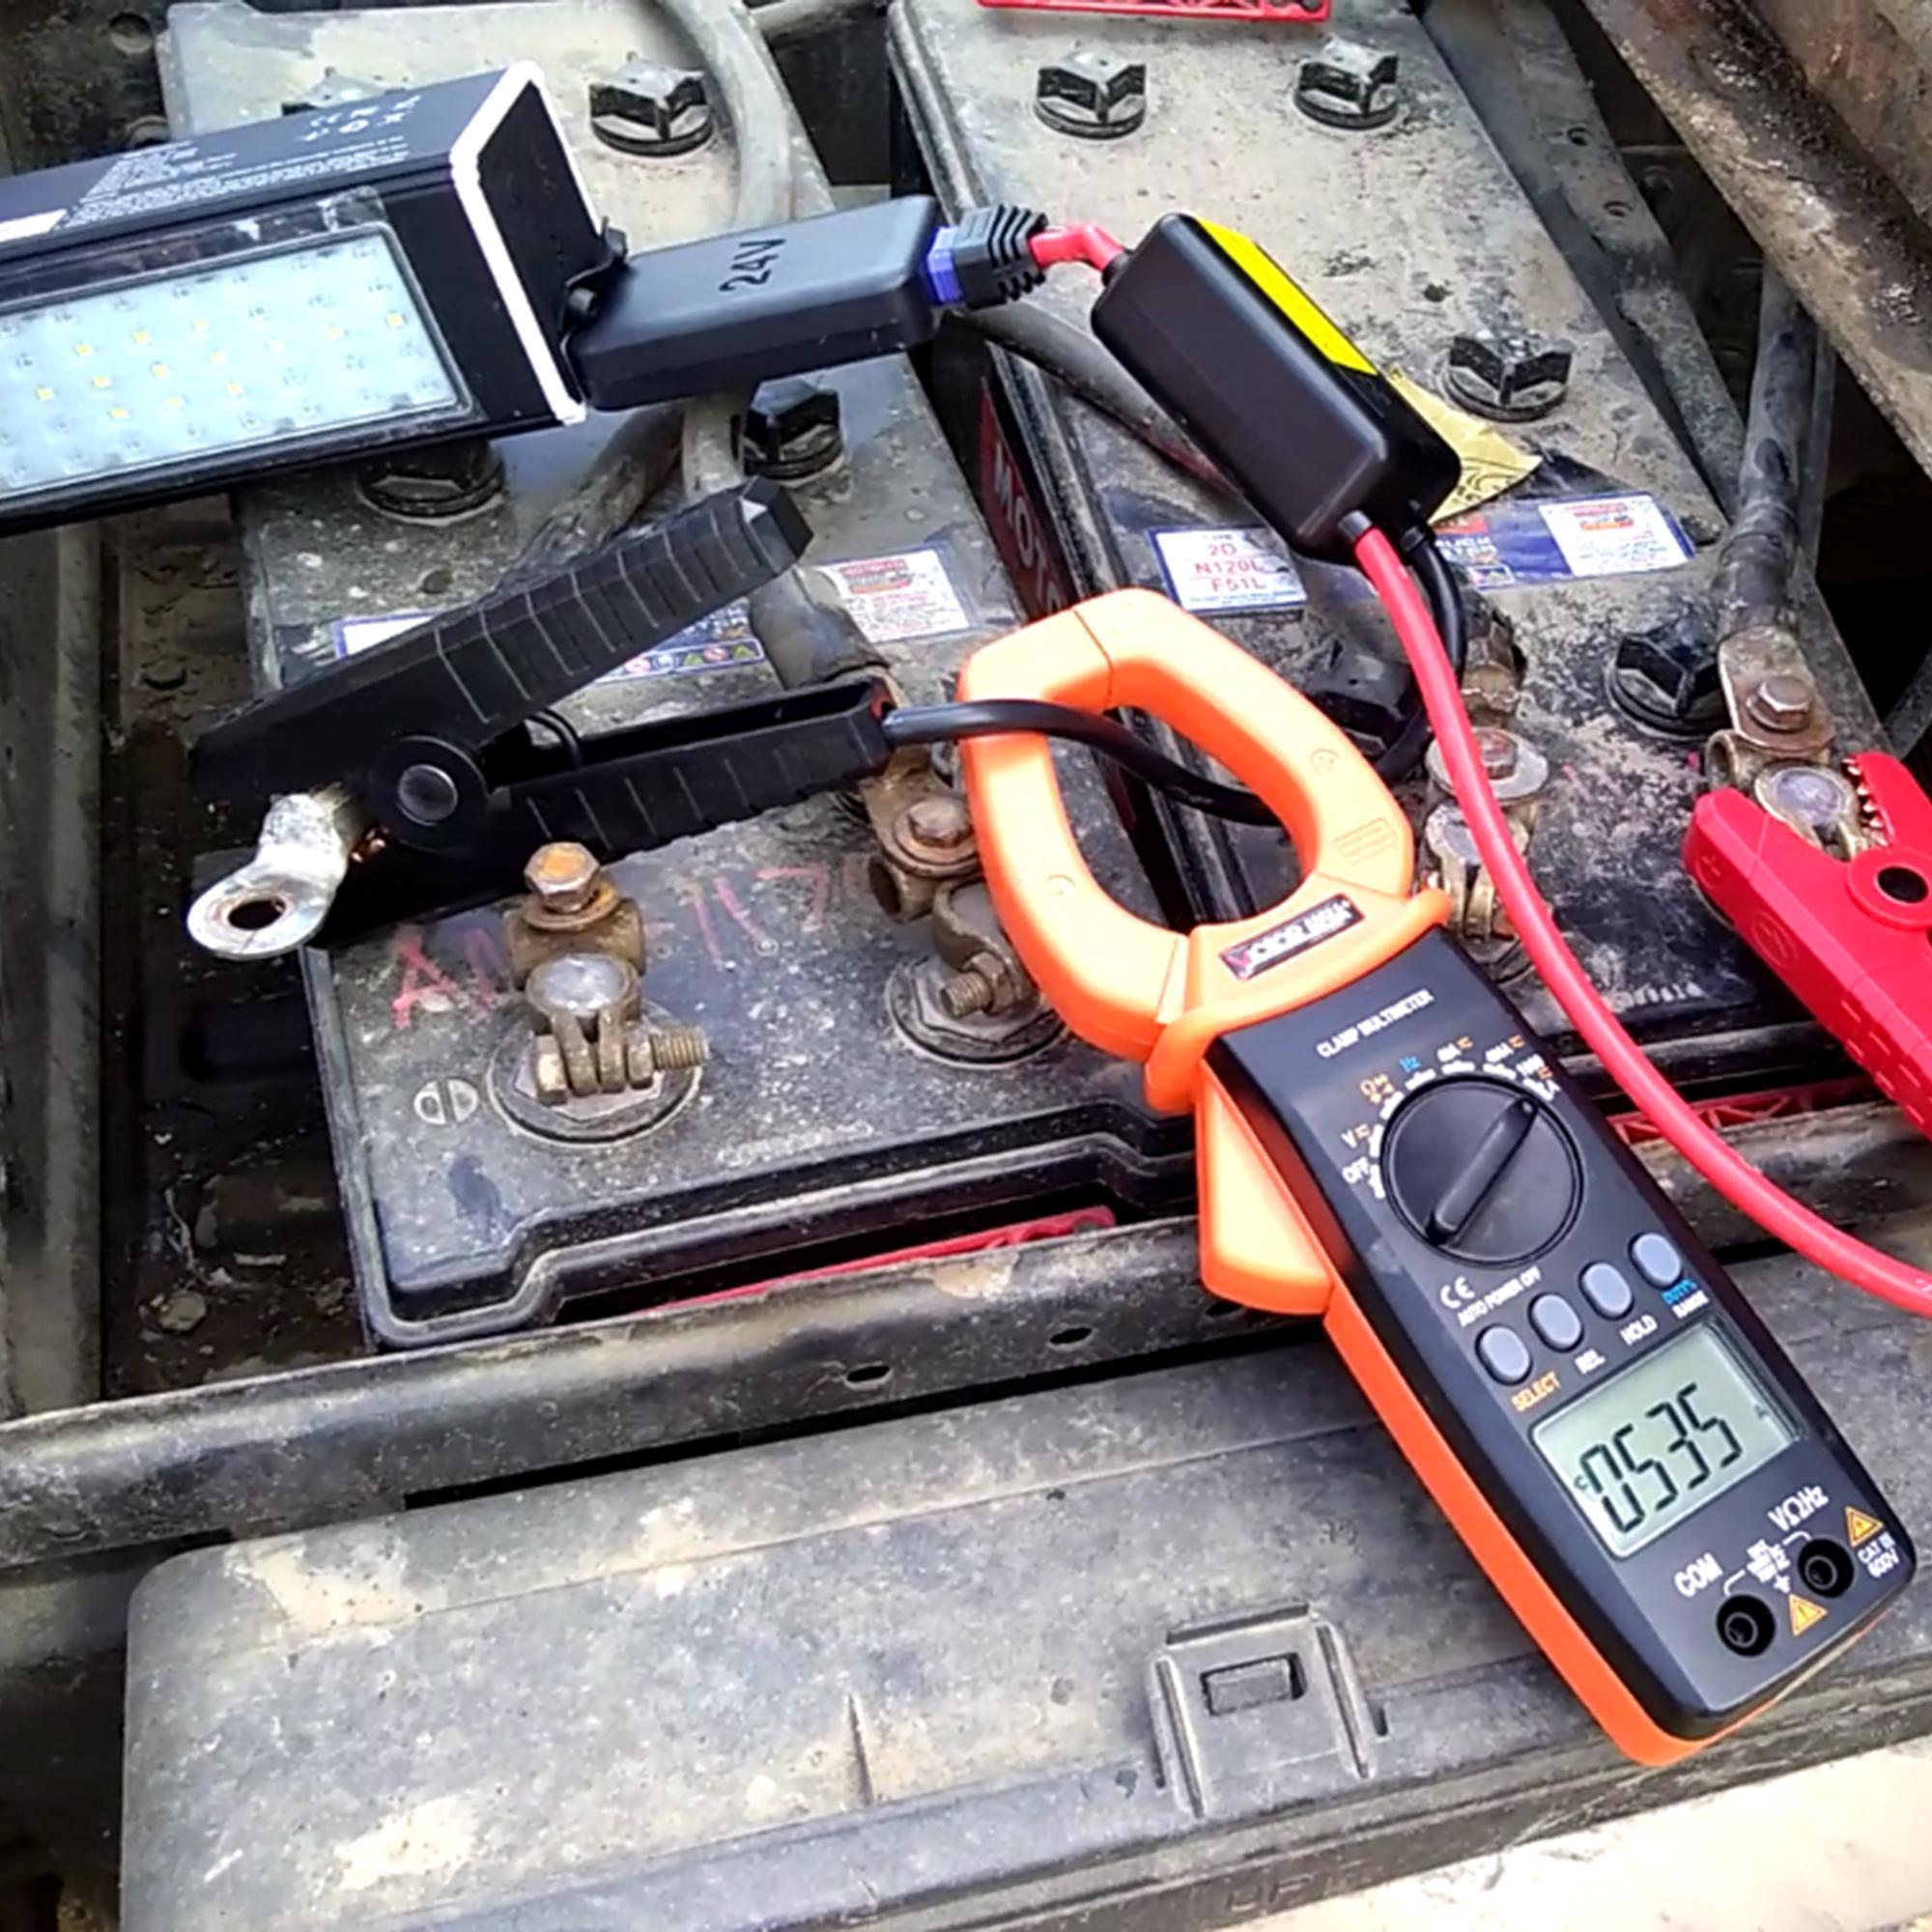 Car Battery Charger For Sale Jump Starter Online Brands Prices Reverse Polarity Protection Gulen Gl10 Black Heavy Duty 12v 24v Portable Truck Power